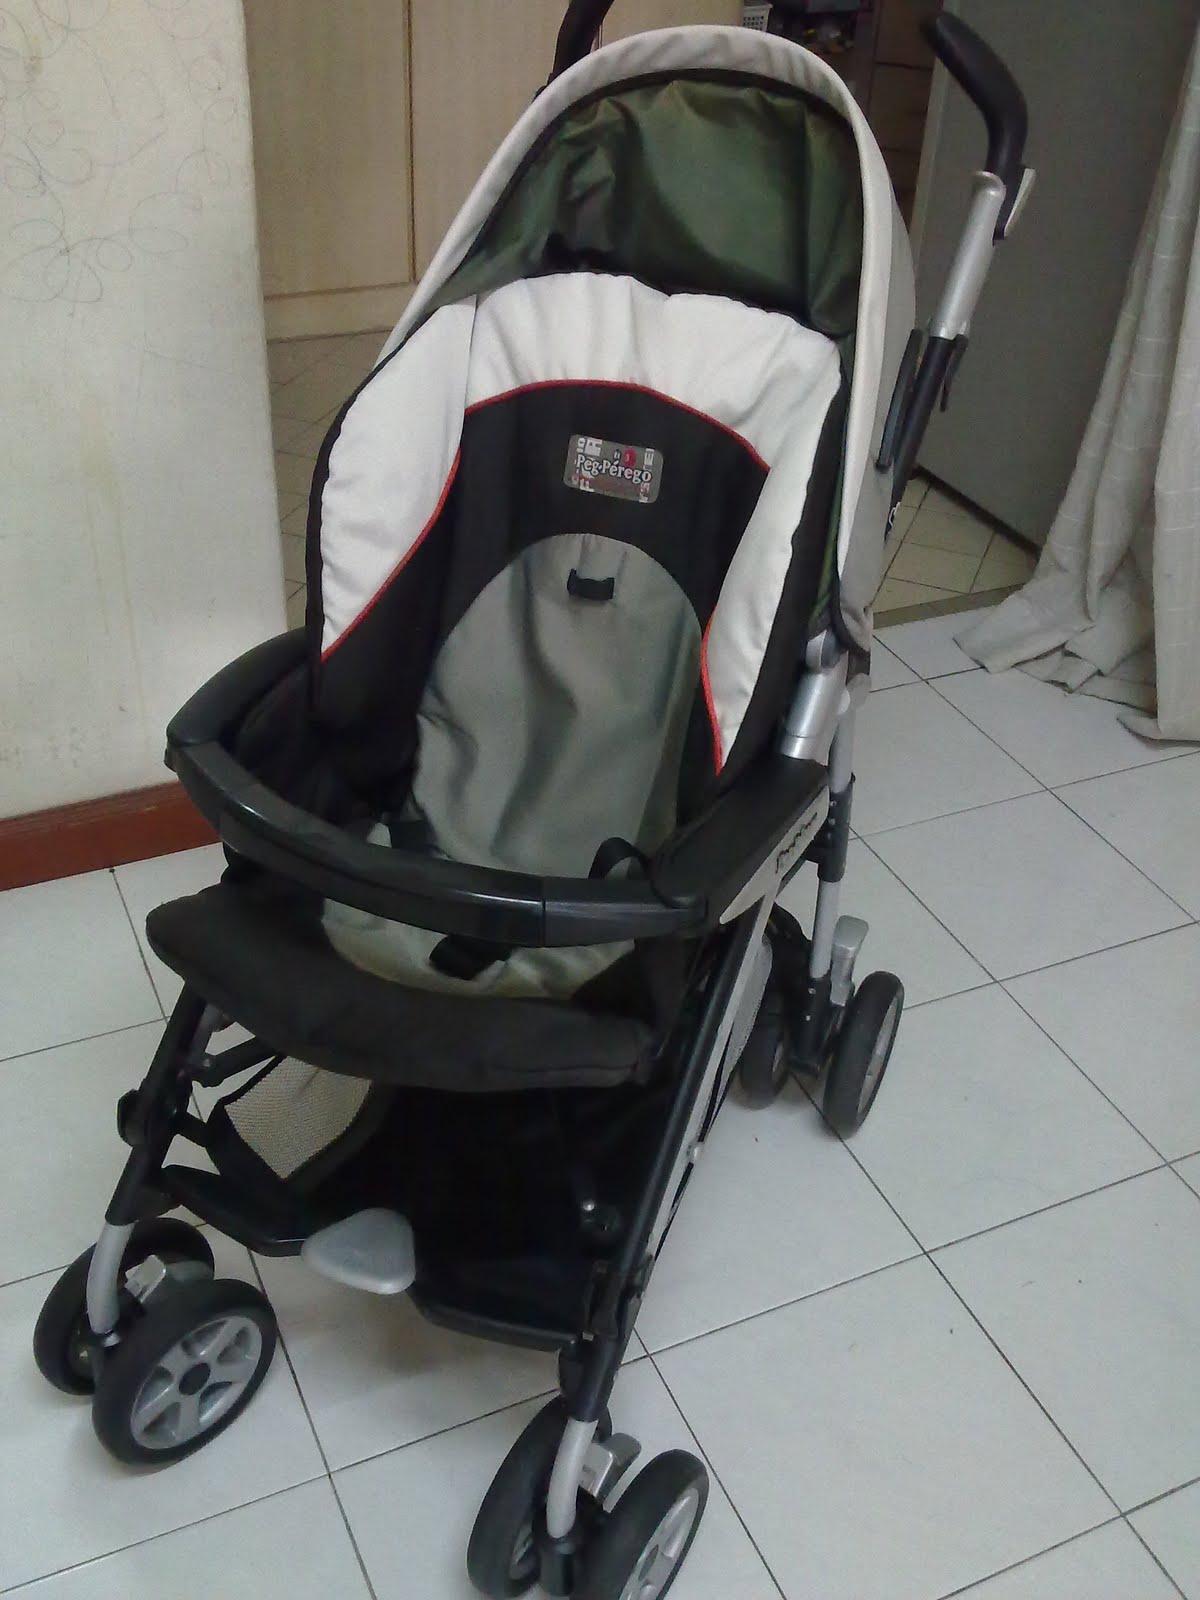 Peg Perego Stroller Replacement Spring : Twinklebibi peg perego pliko p